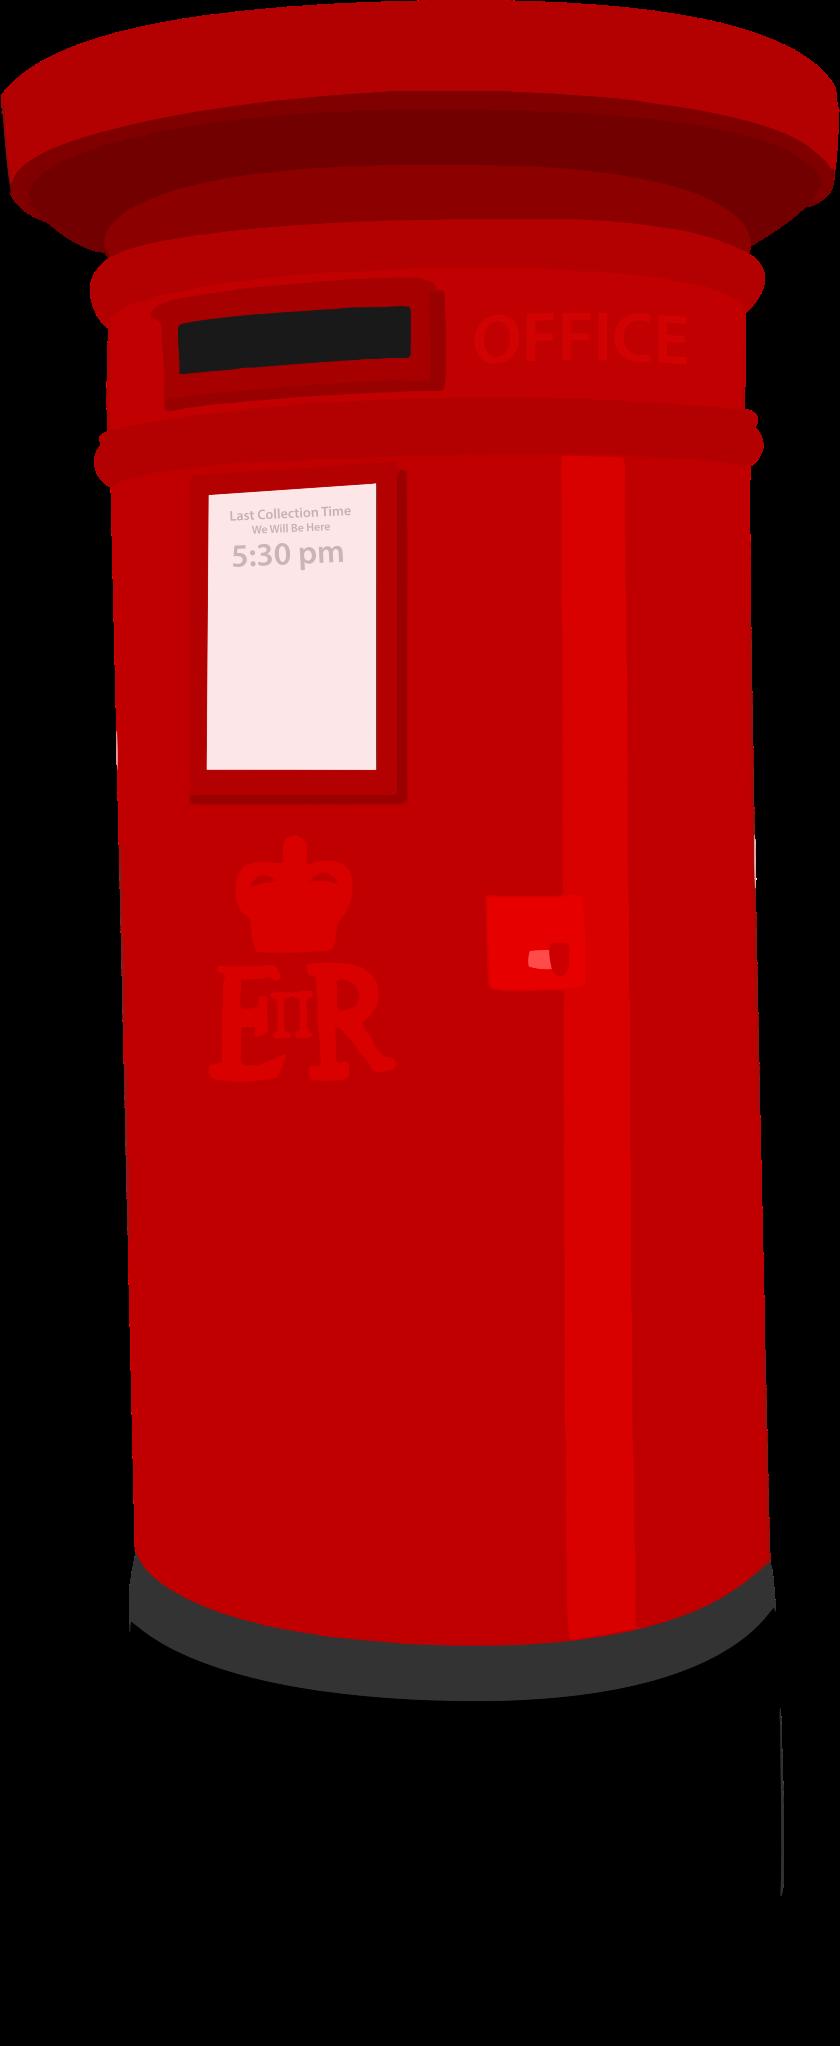 Post Office Box Clip Art – Clipart Download